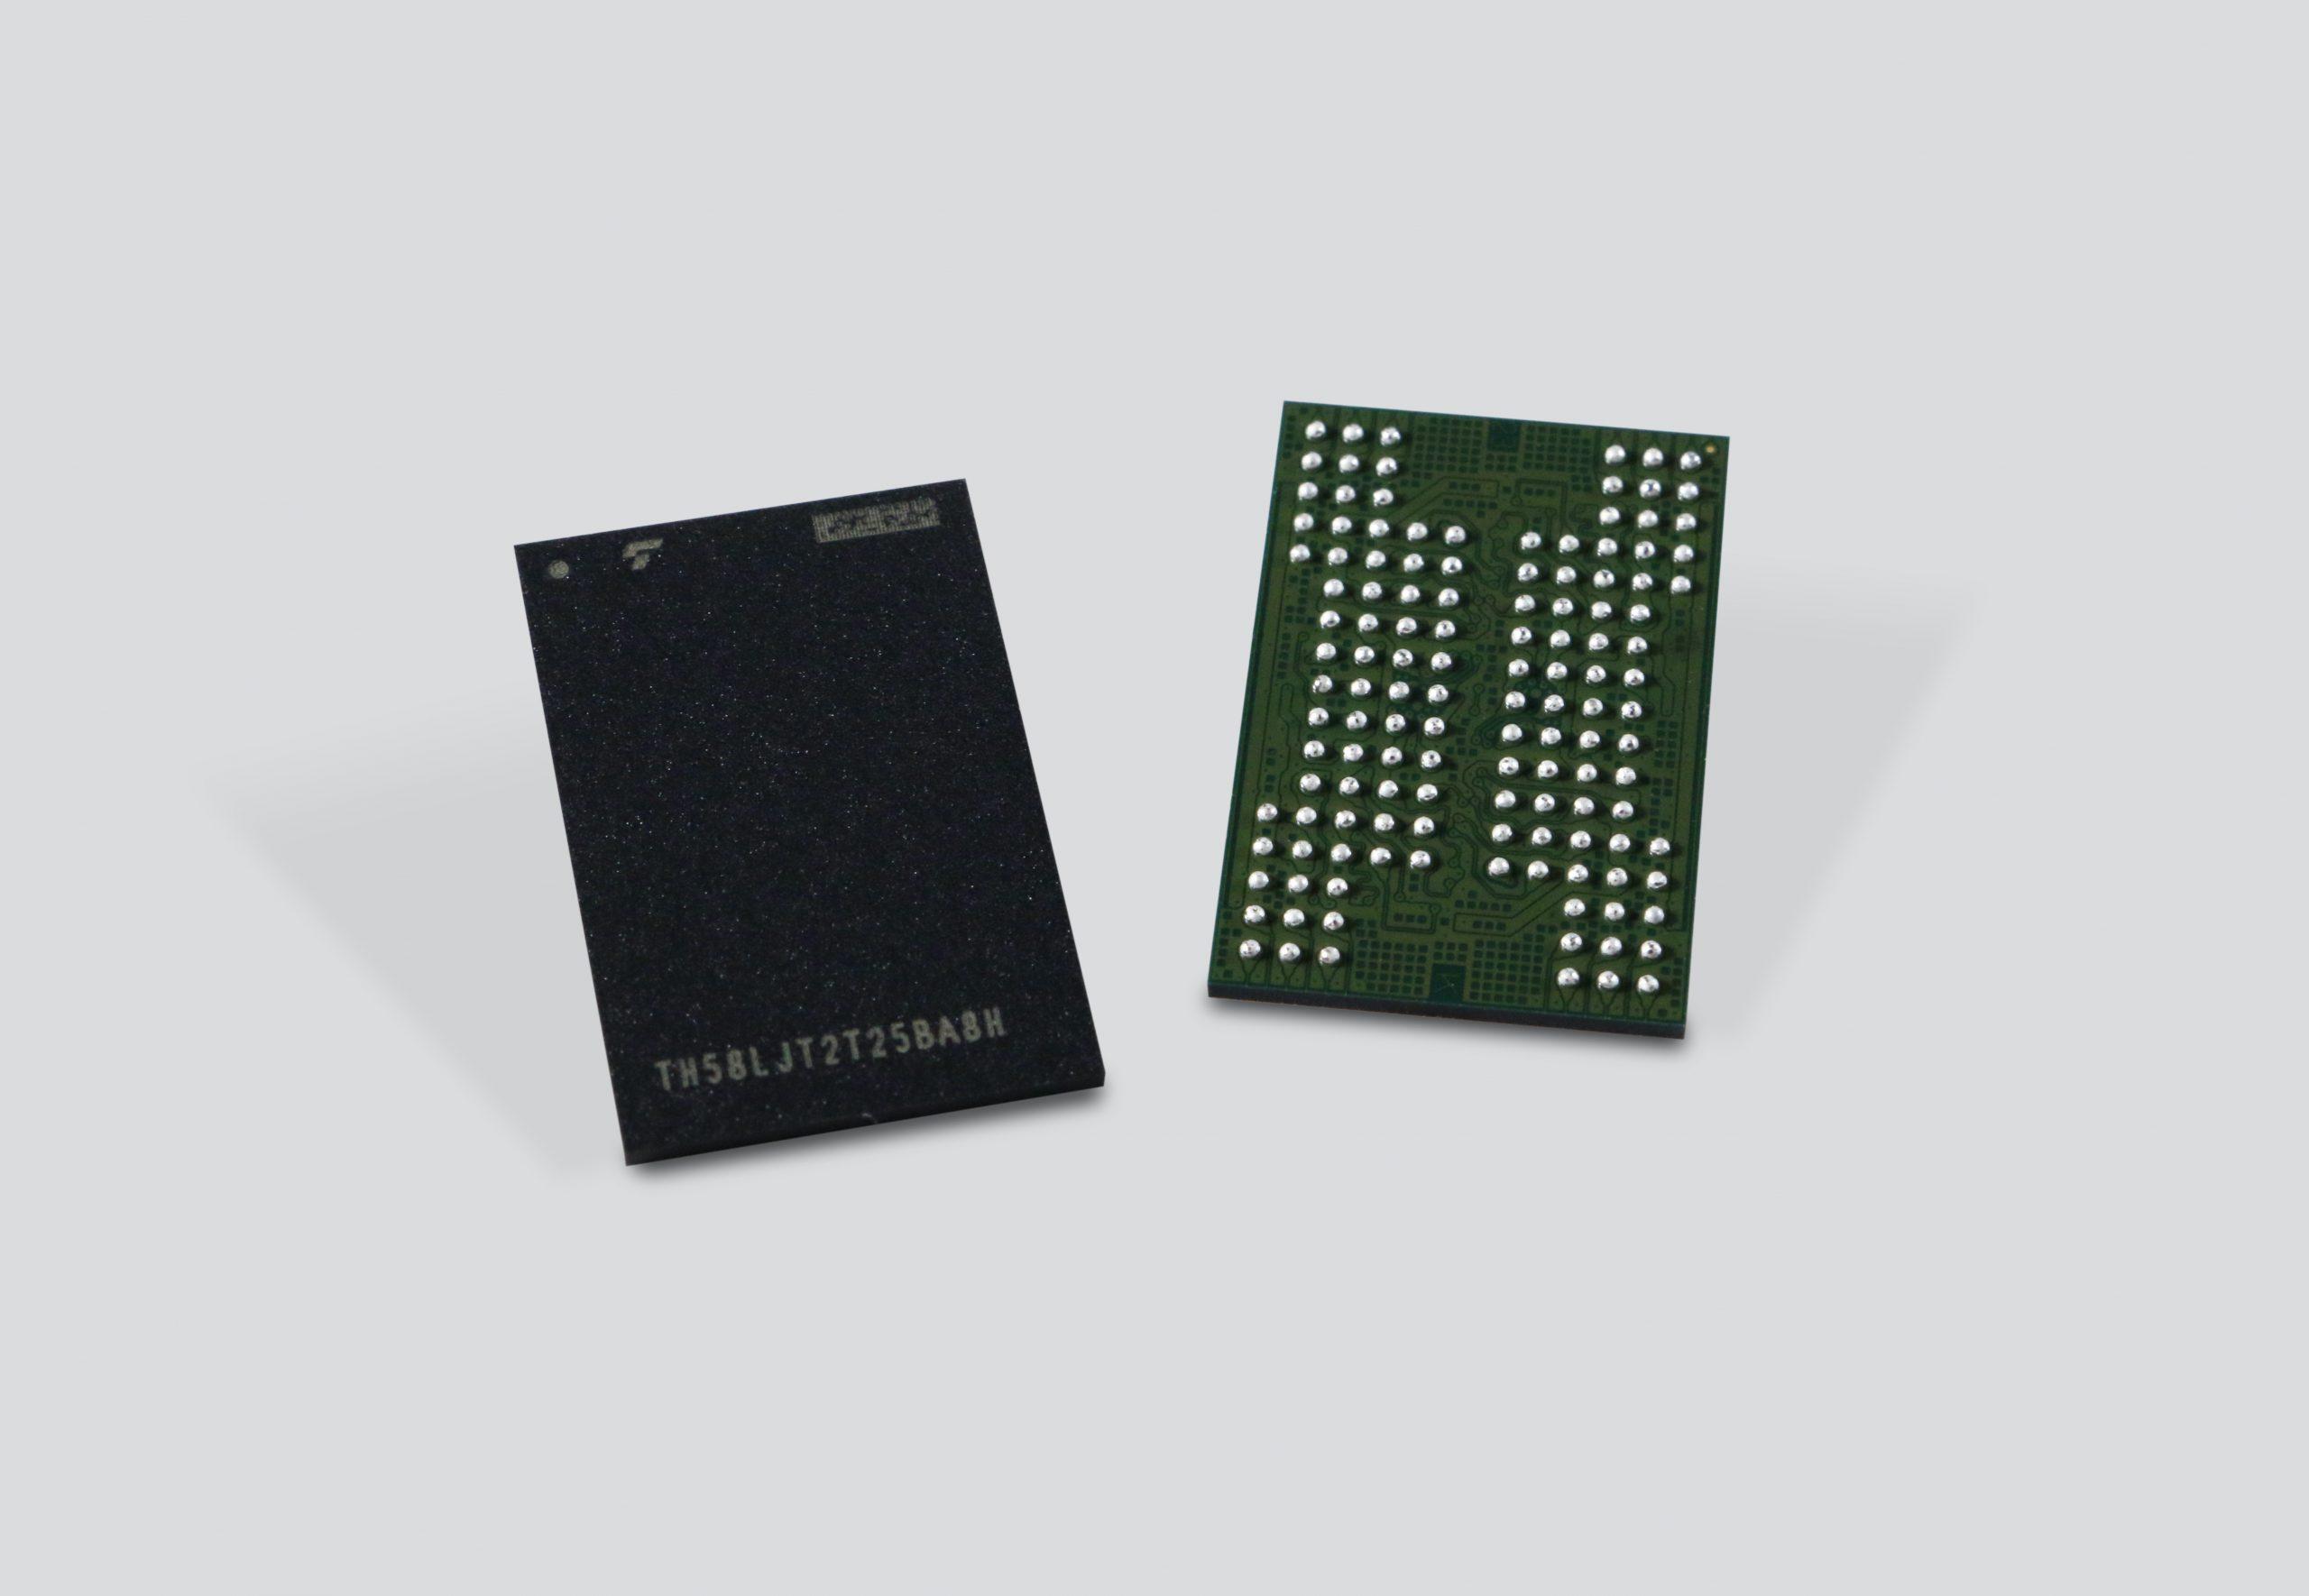 3D-NAND-Flash-Speicherlösung